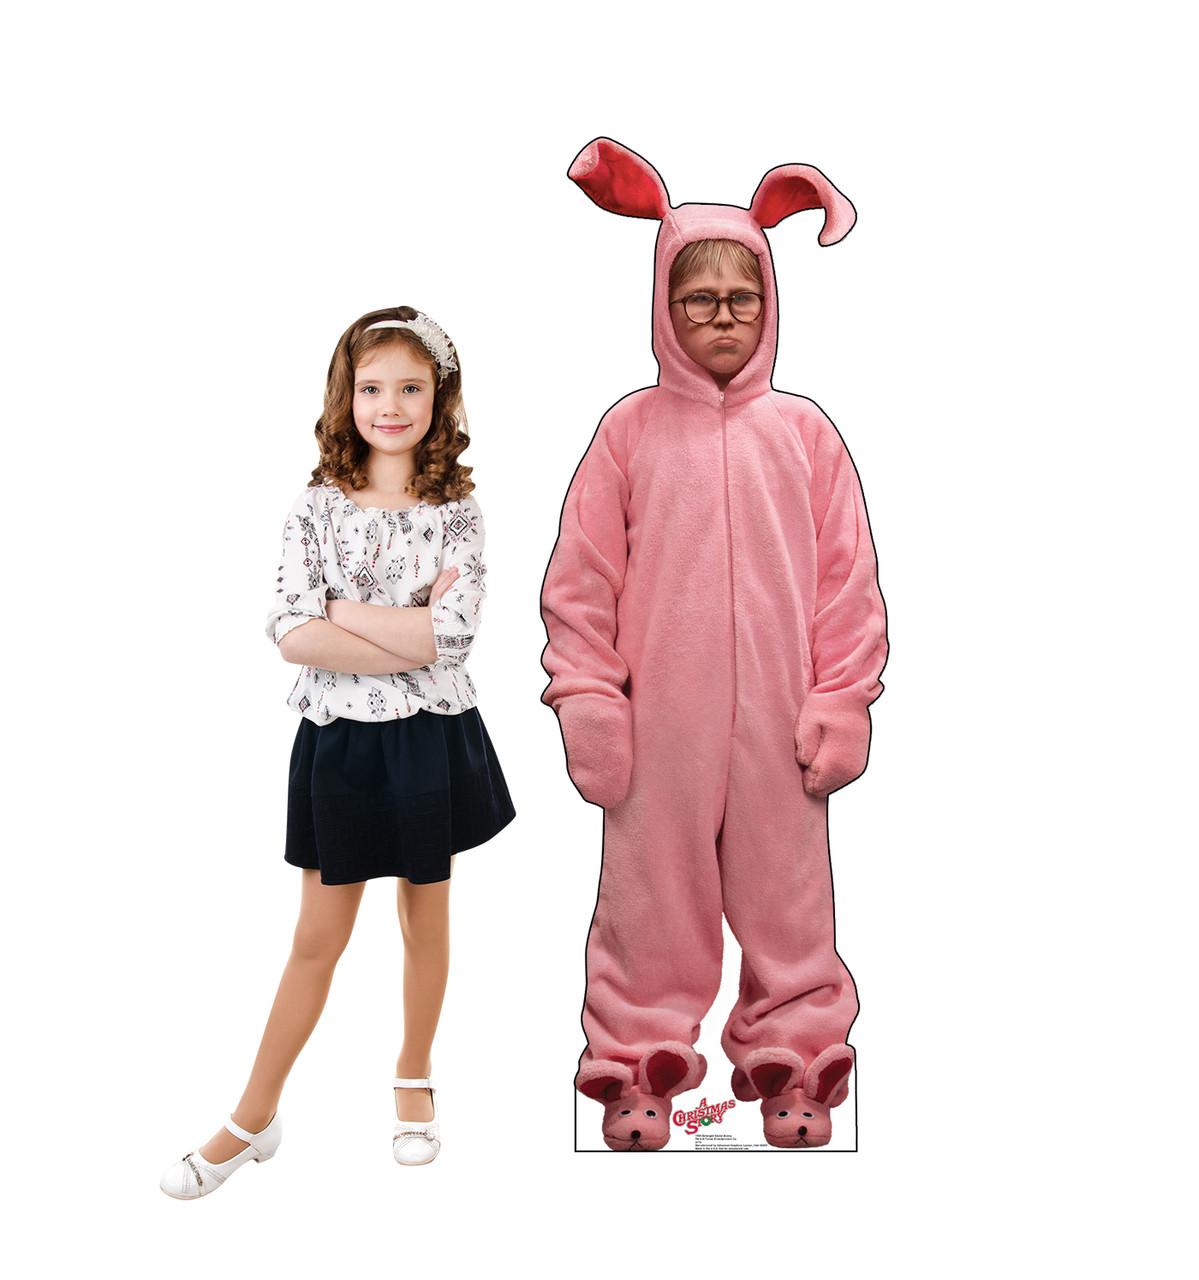 Deranged Easter Bunny - A Christmas Story - Cardboard Cutout